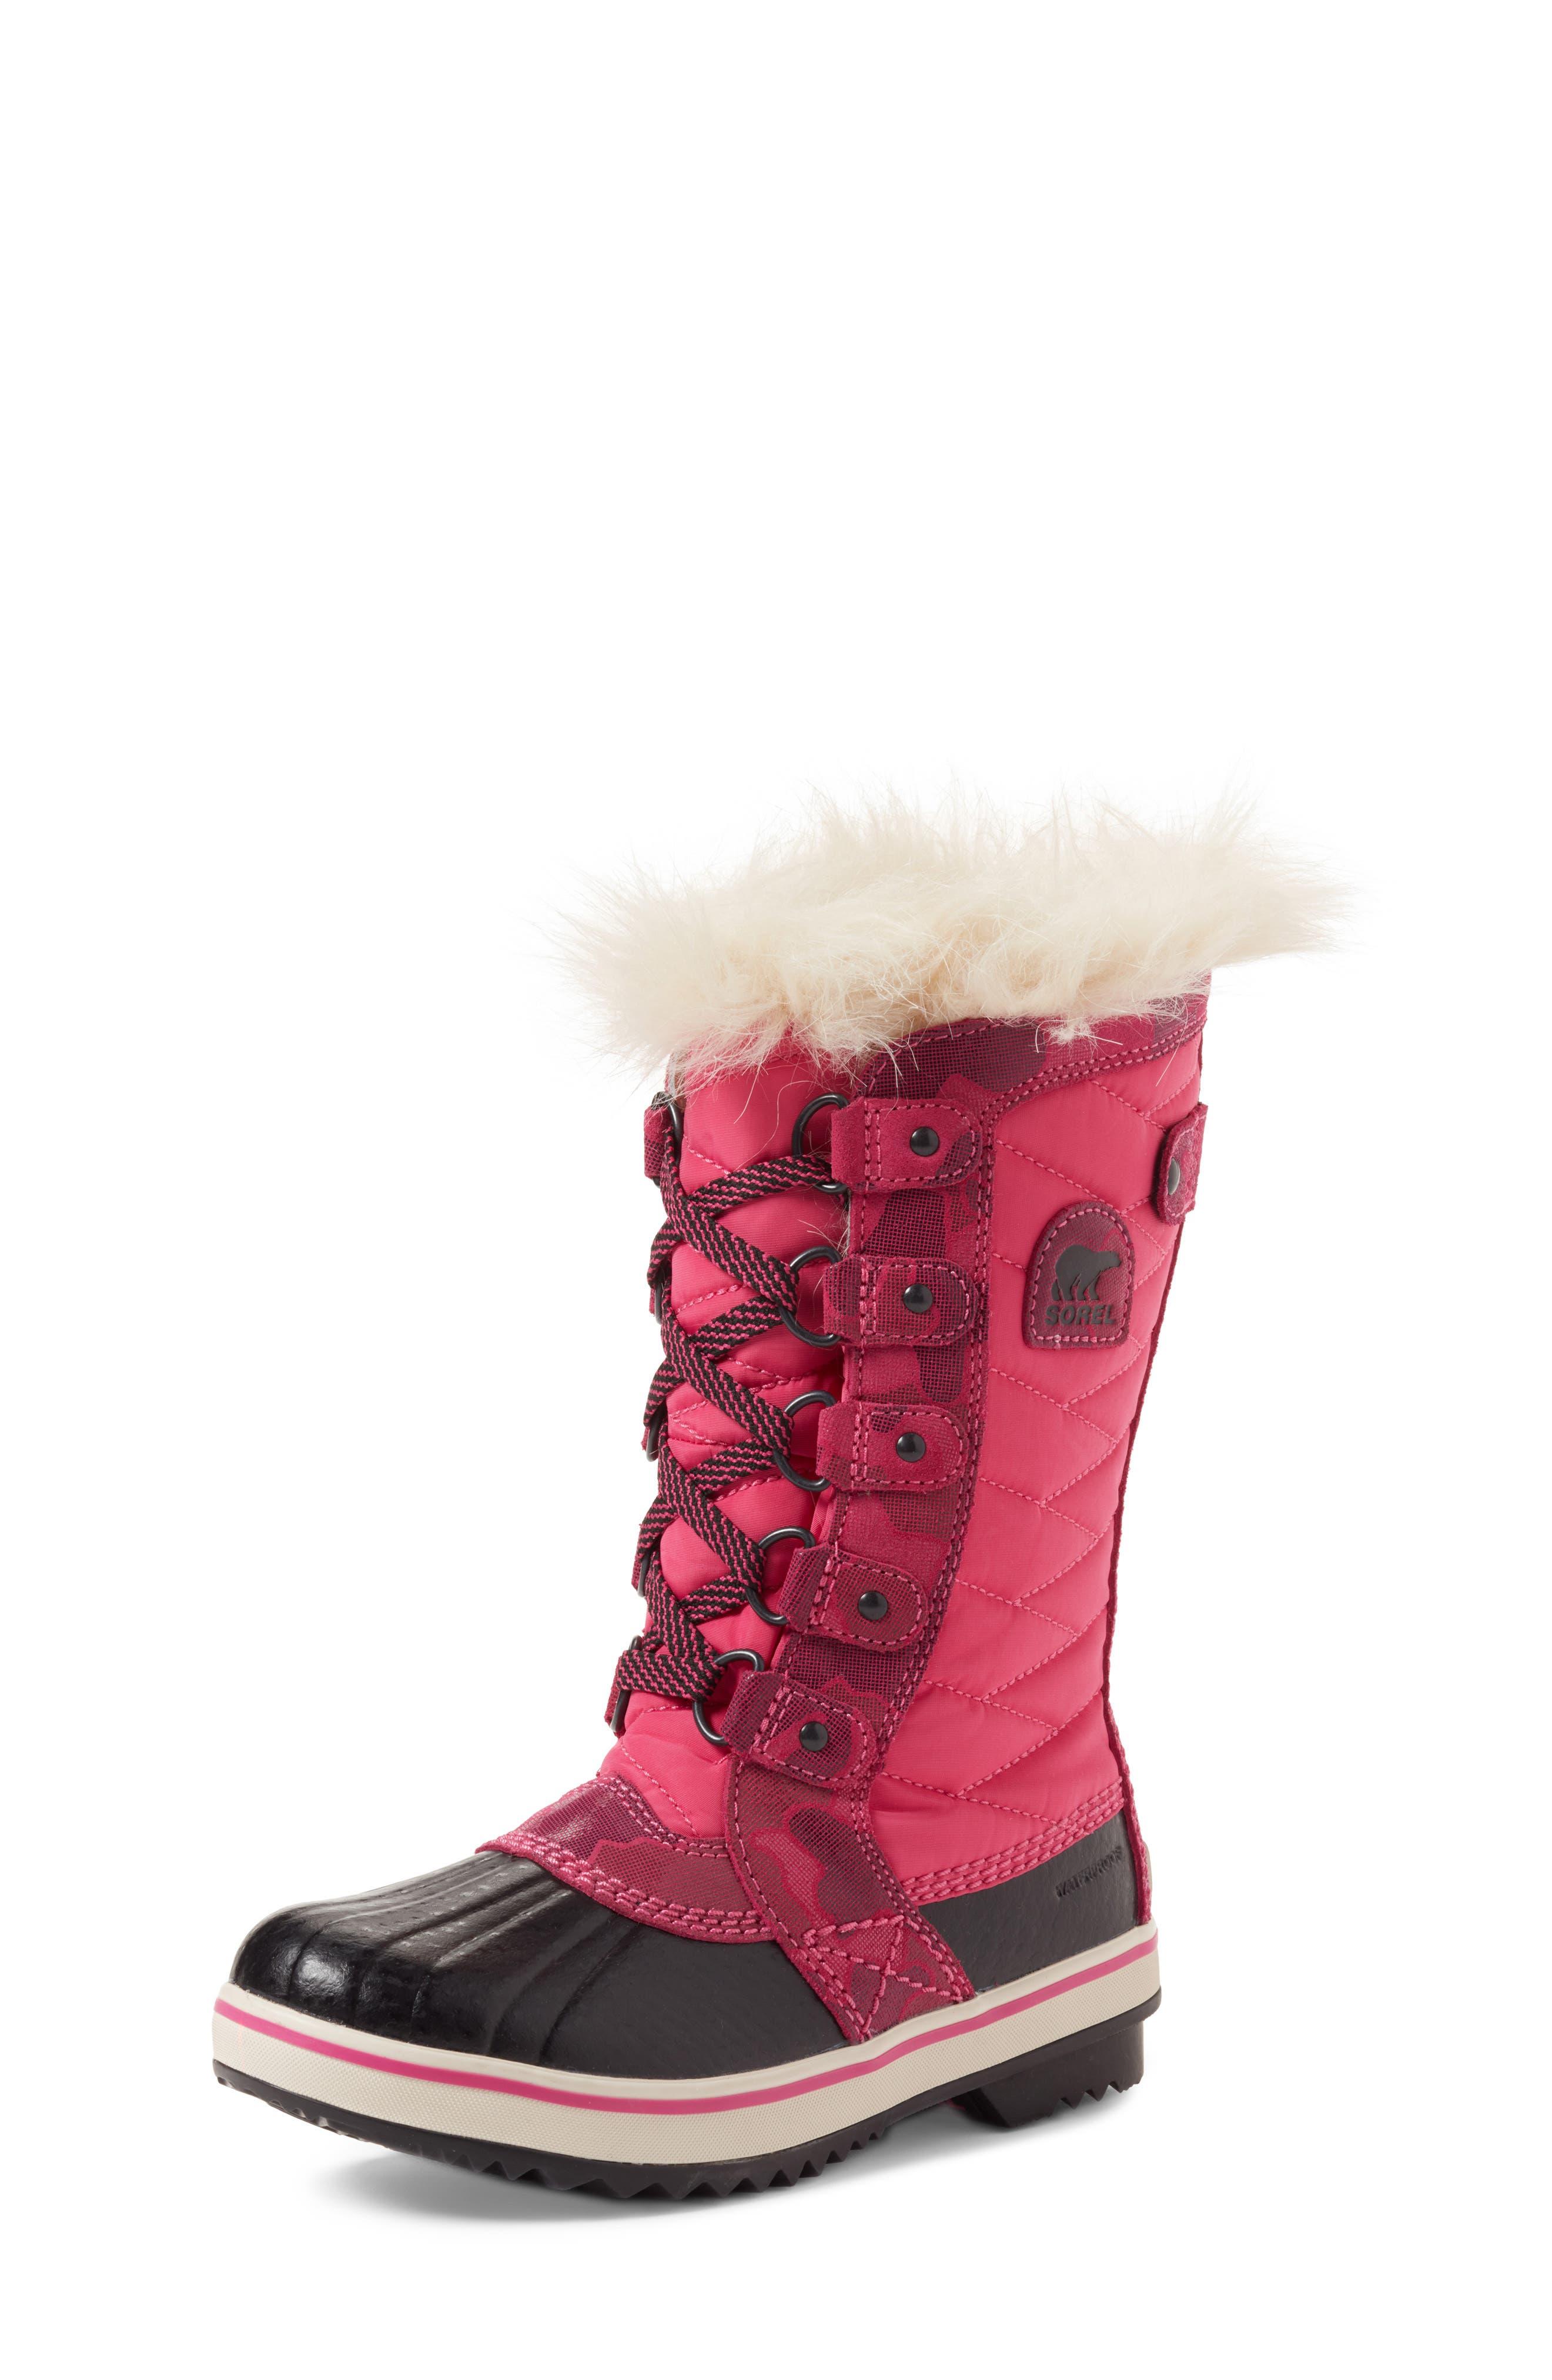 Main Image - SOREL Tofino II Faux Fur Lined Waterproof Boot (Little Kid & Big Kid)